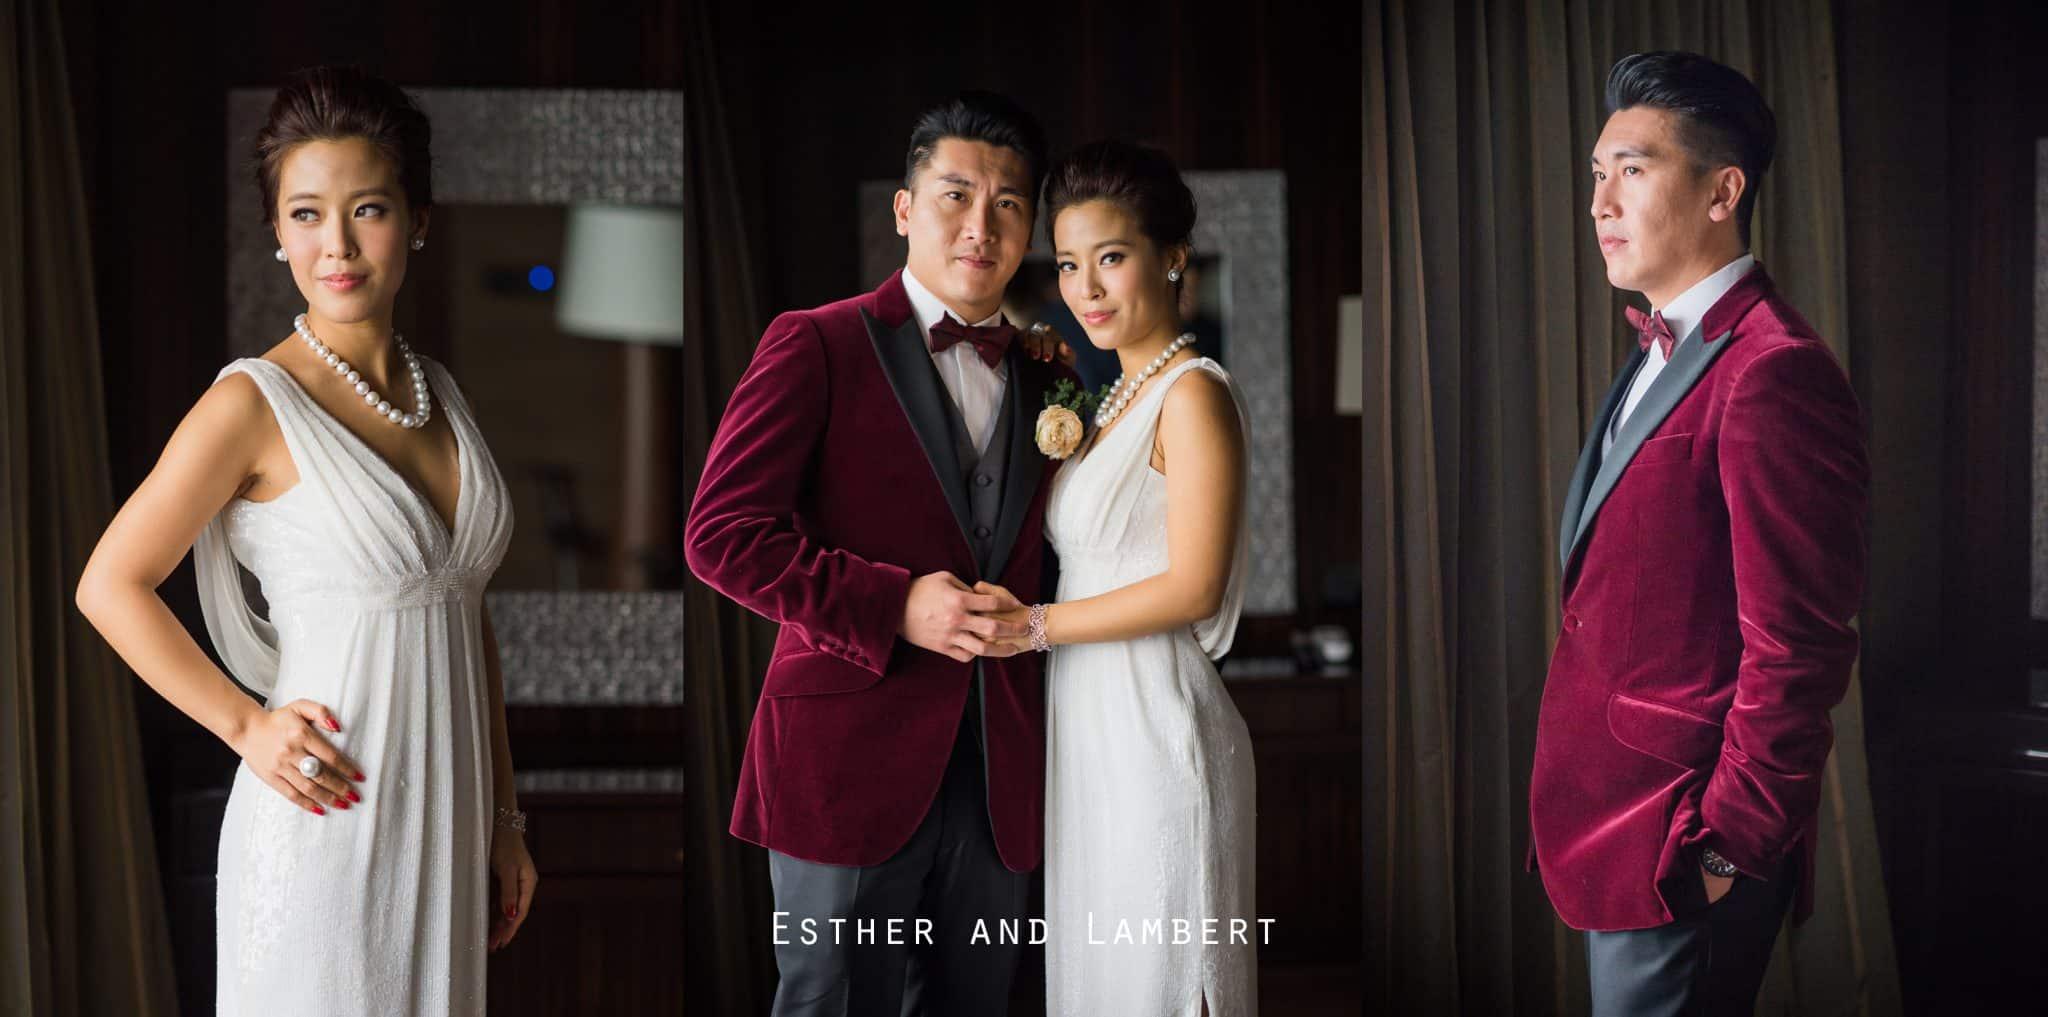 Esther and Lambert wedding day